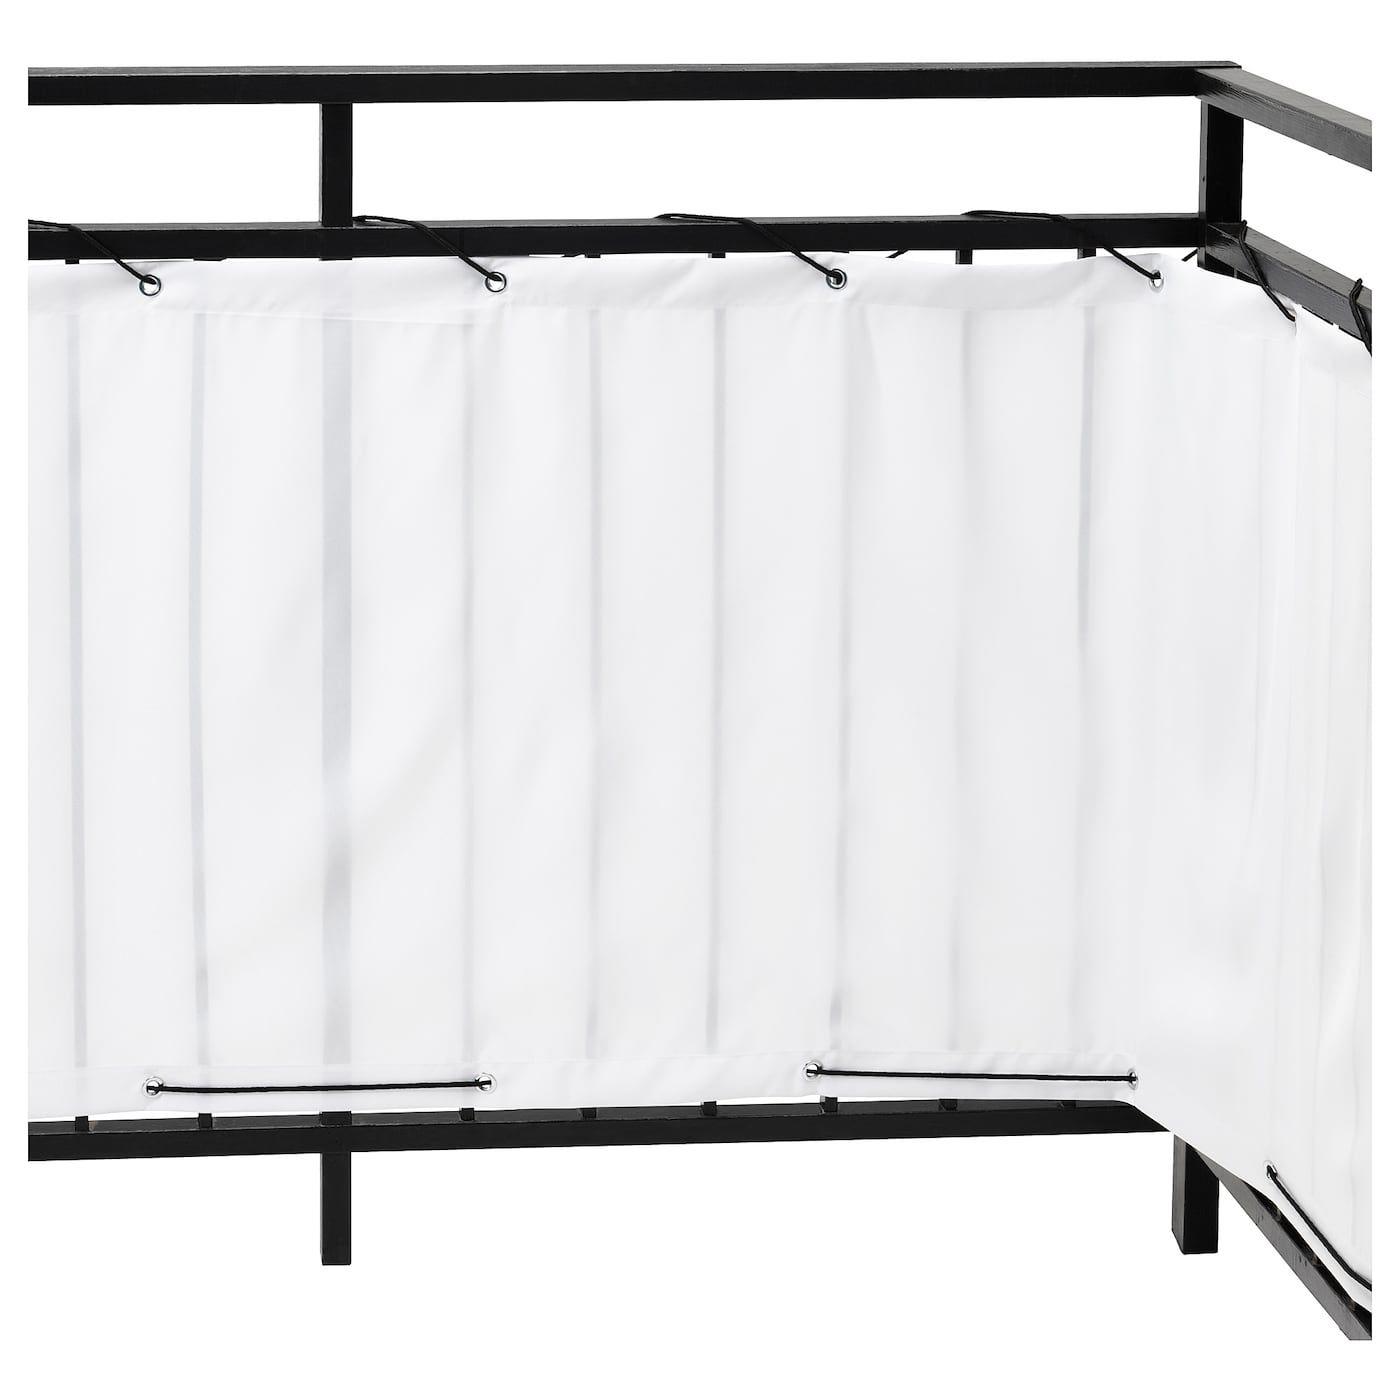 DYNING Balcony privacy screen, white, 98 3/8x31 1/2 - IKEA